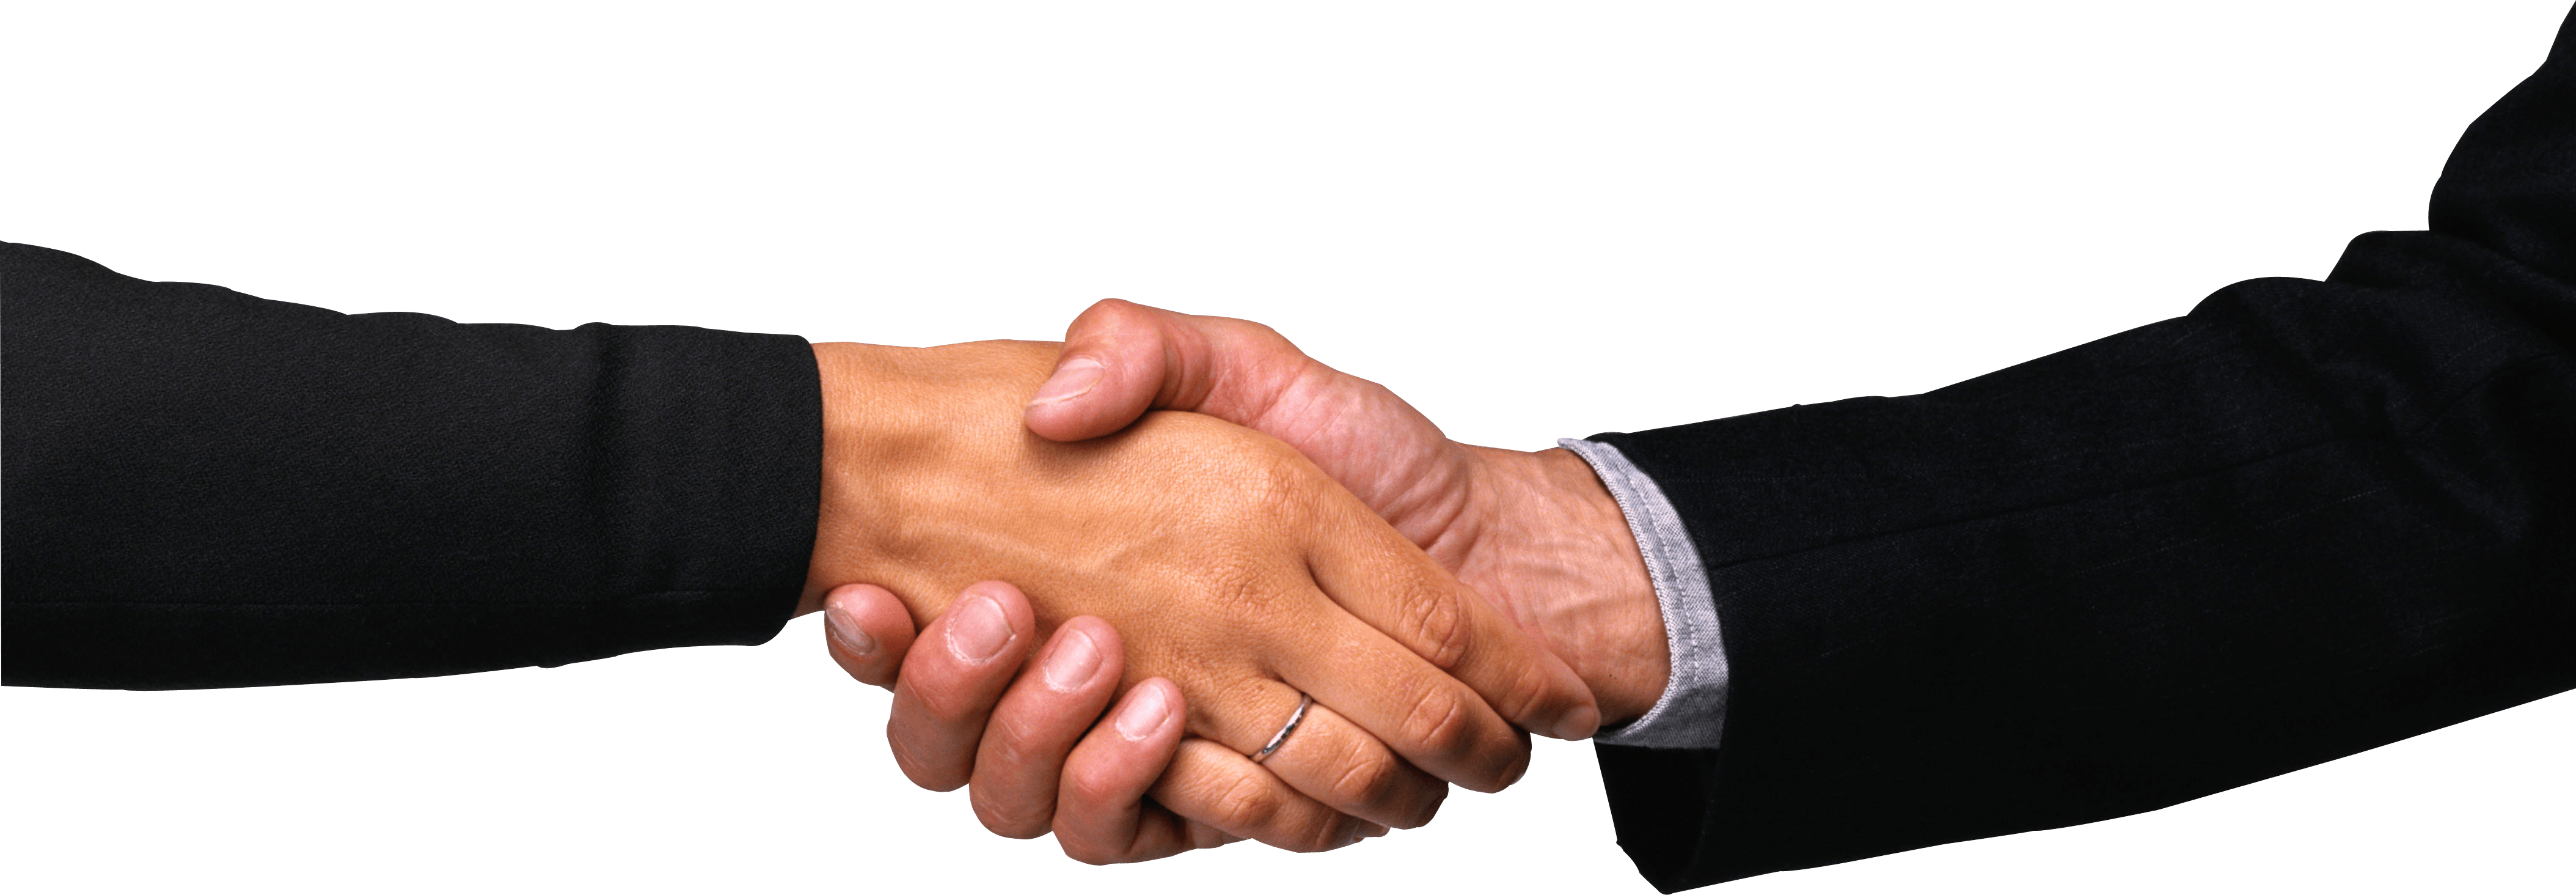 Download PNG image - Handshake Png Hands Image Download - Handshake PNG HD